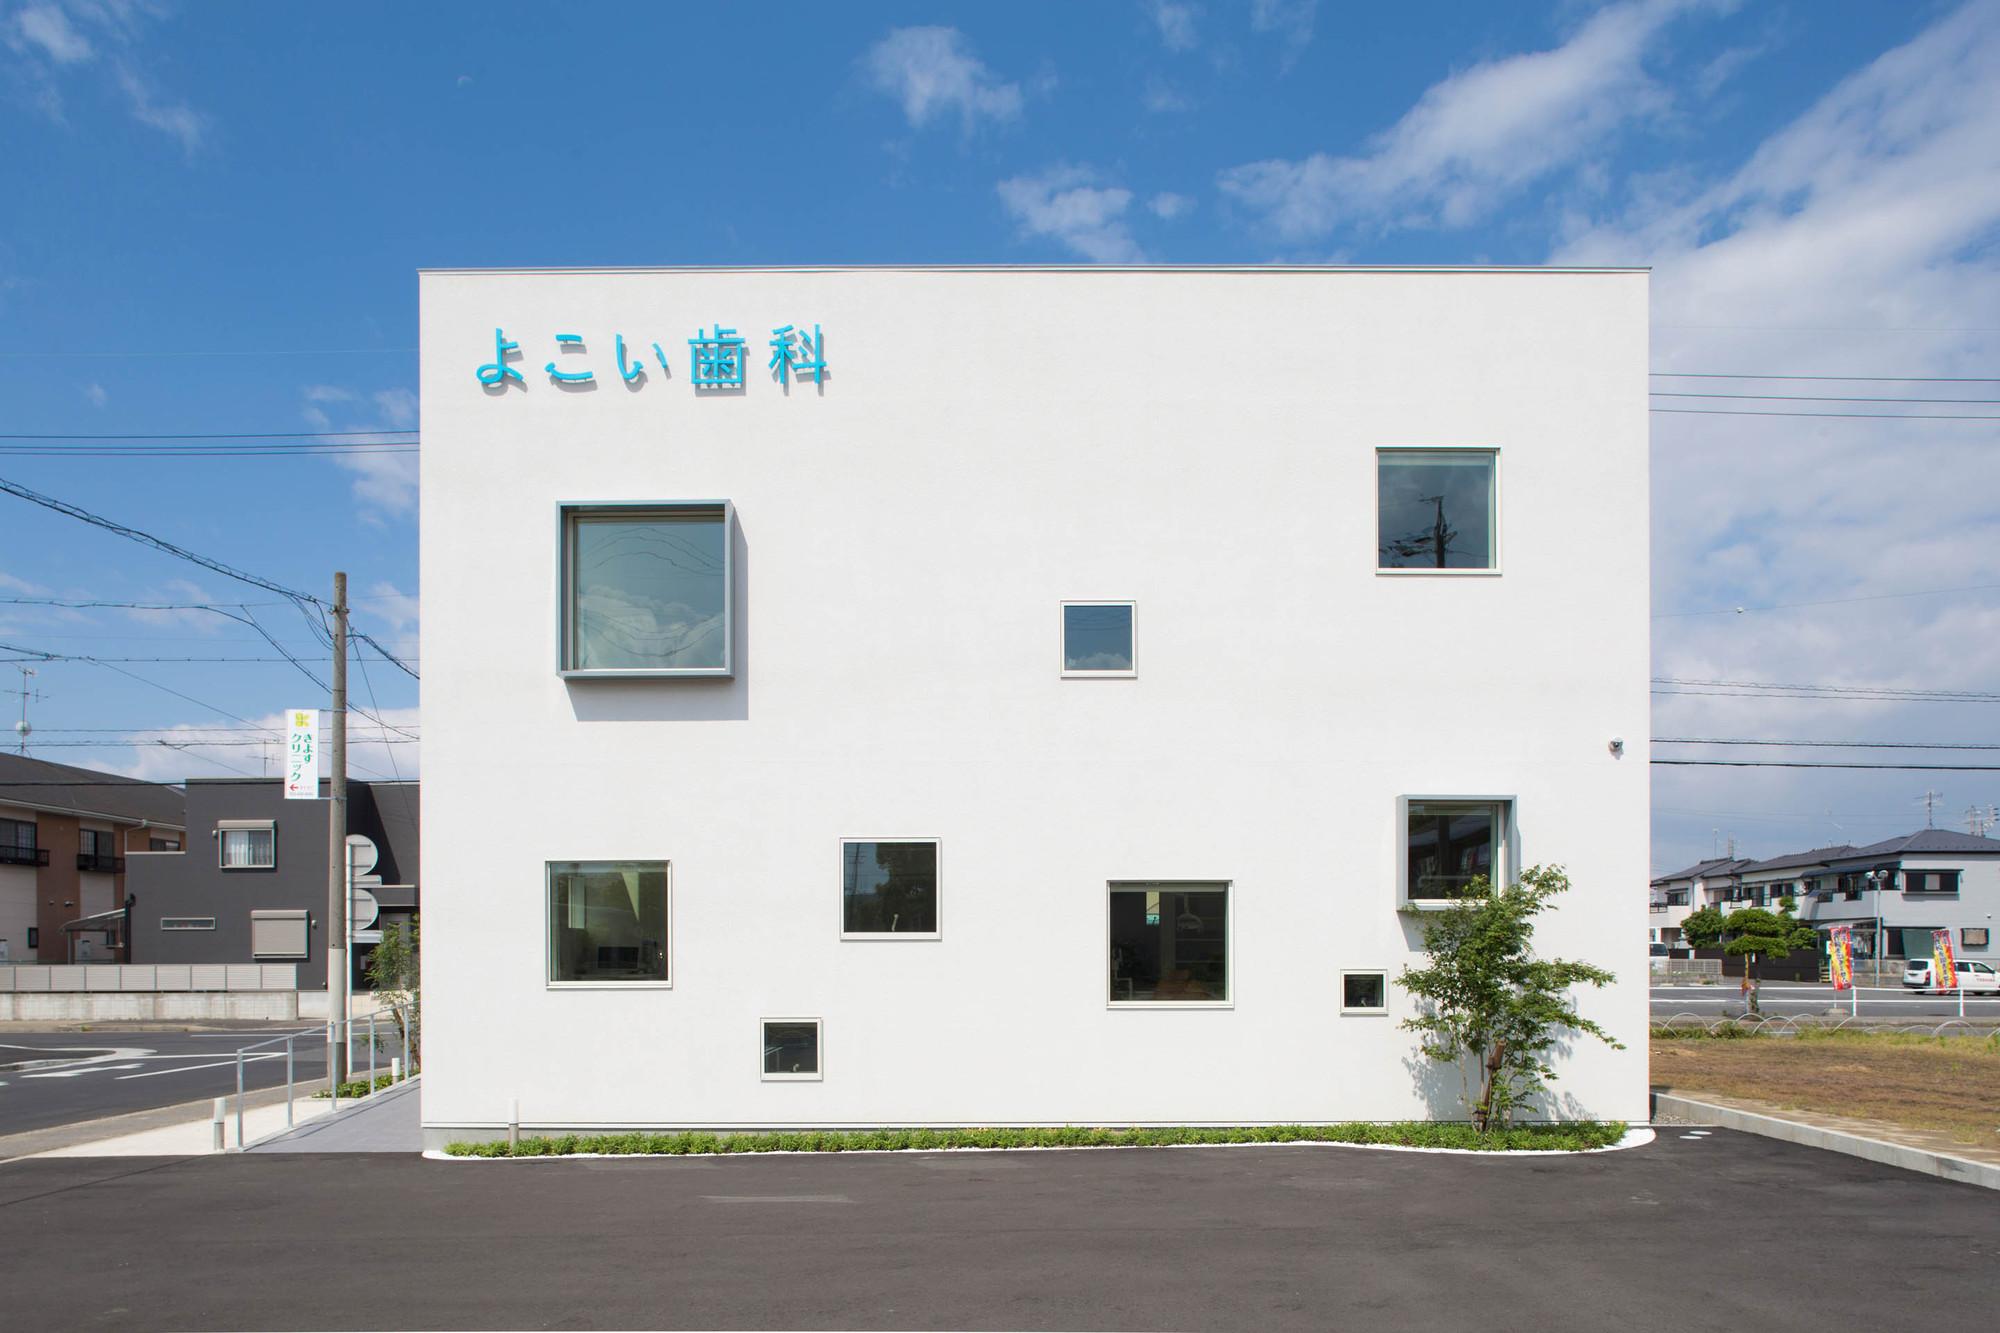 Clínica Dental Yokoi / iks design + msd-office, © Keisuke Nakagami